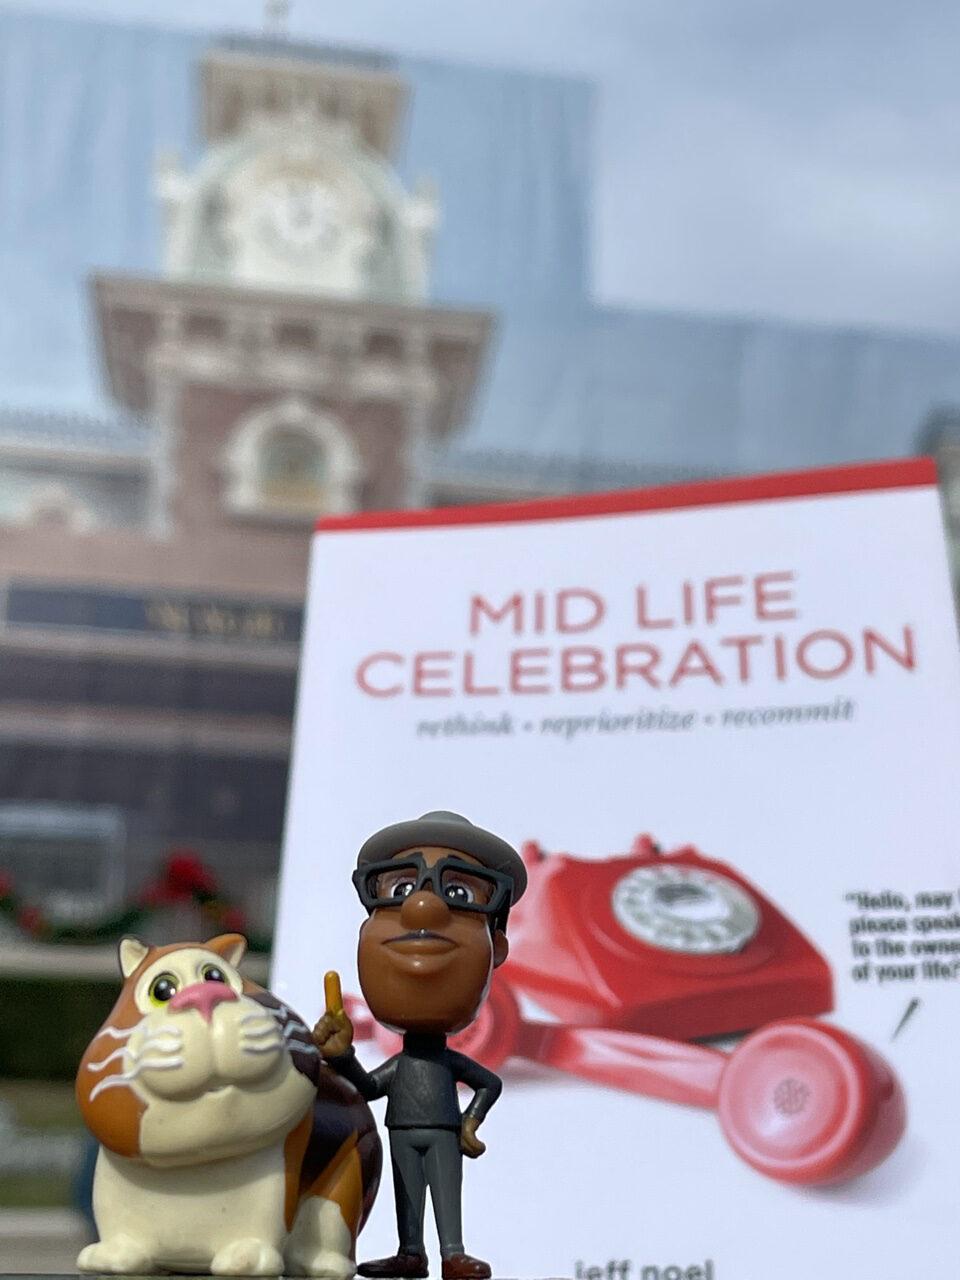 Midlife celebration book with Disney Soul toys